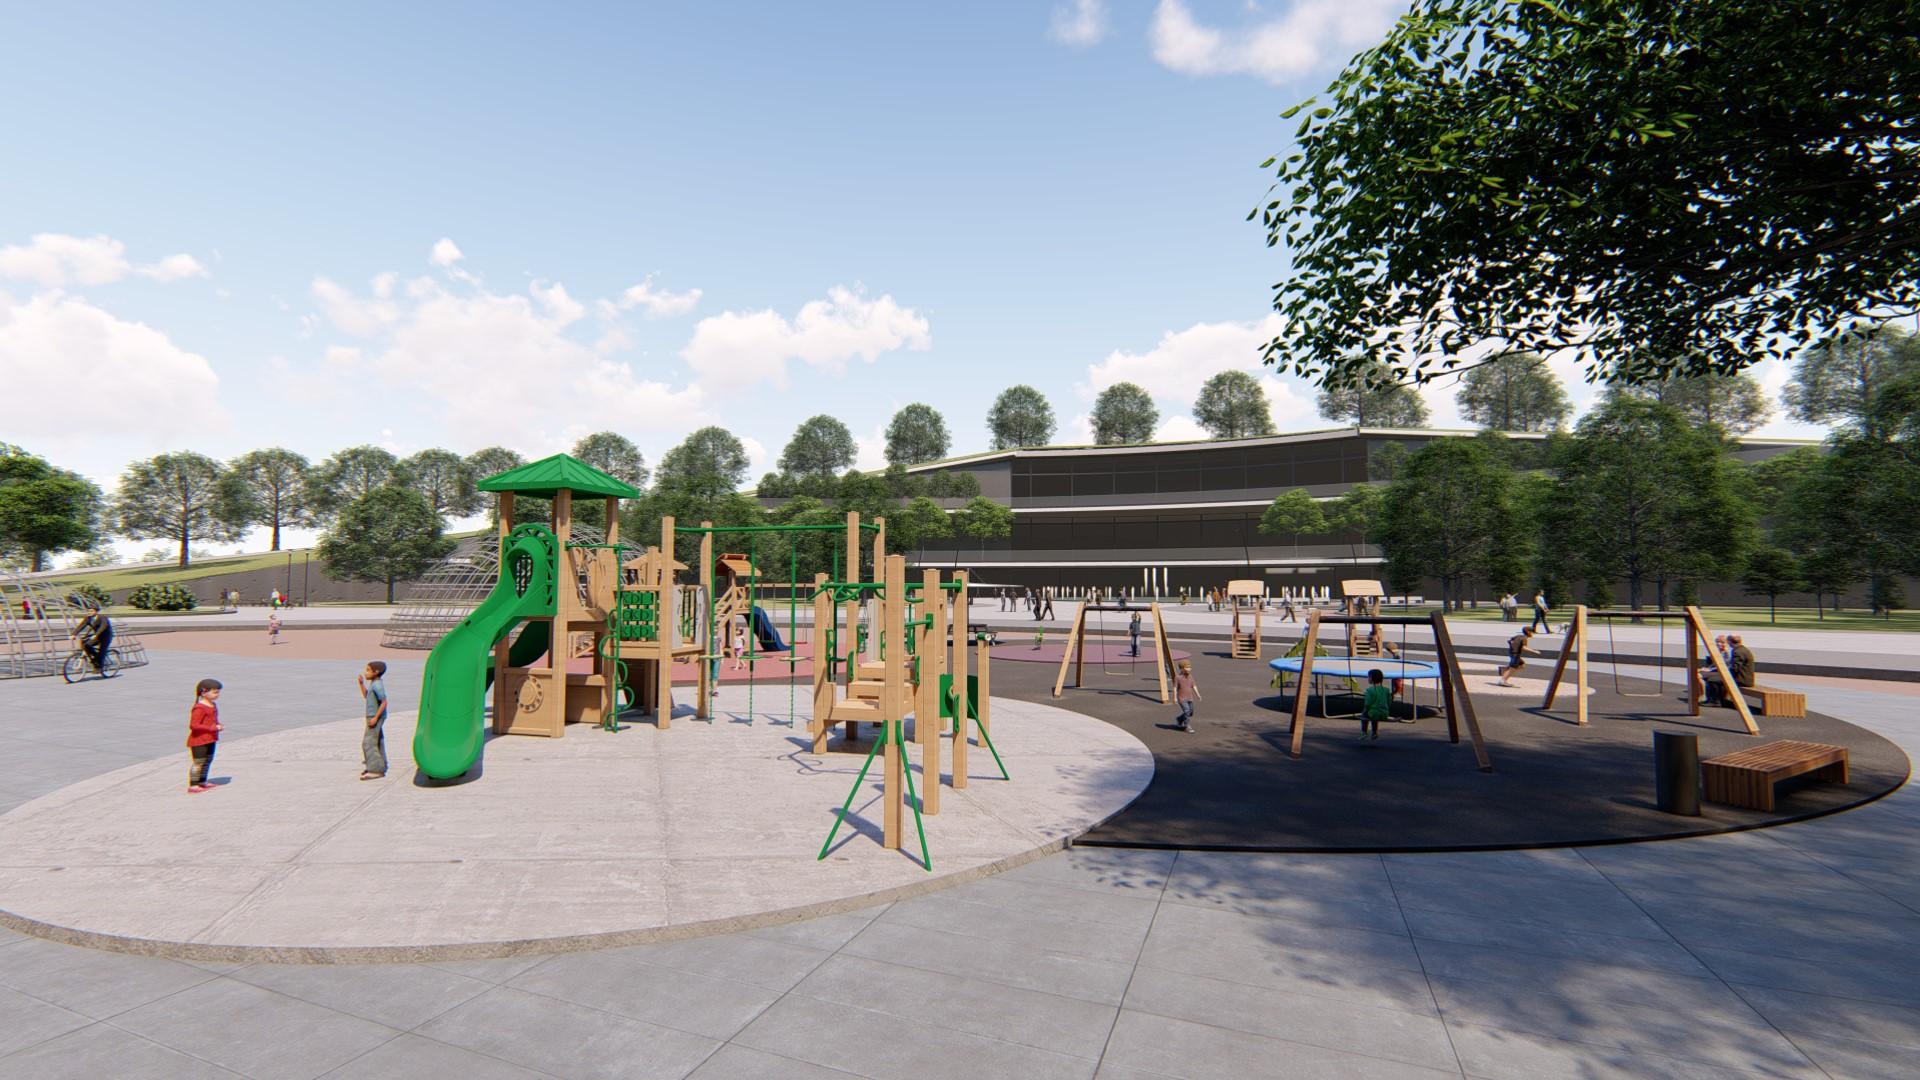 Ground level view of the playground.